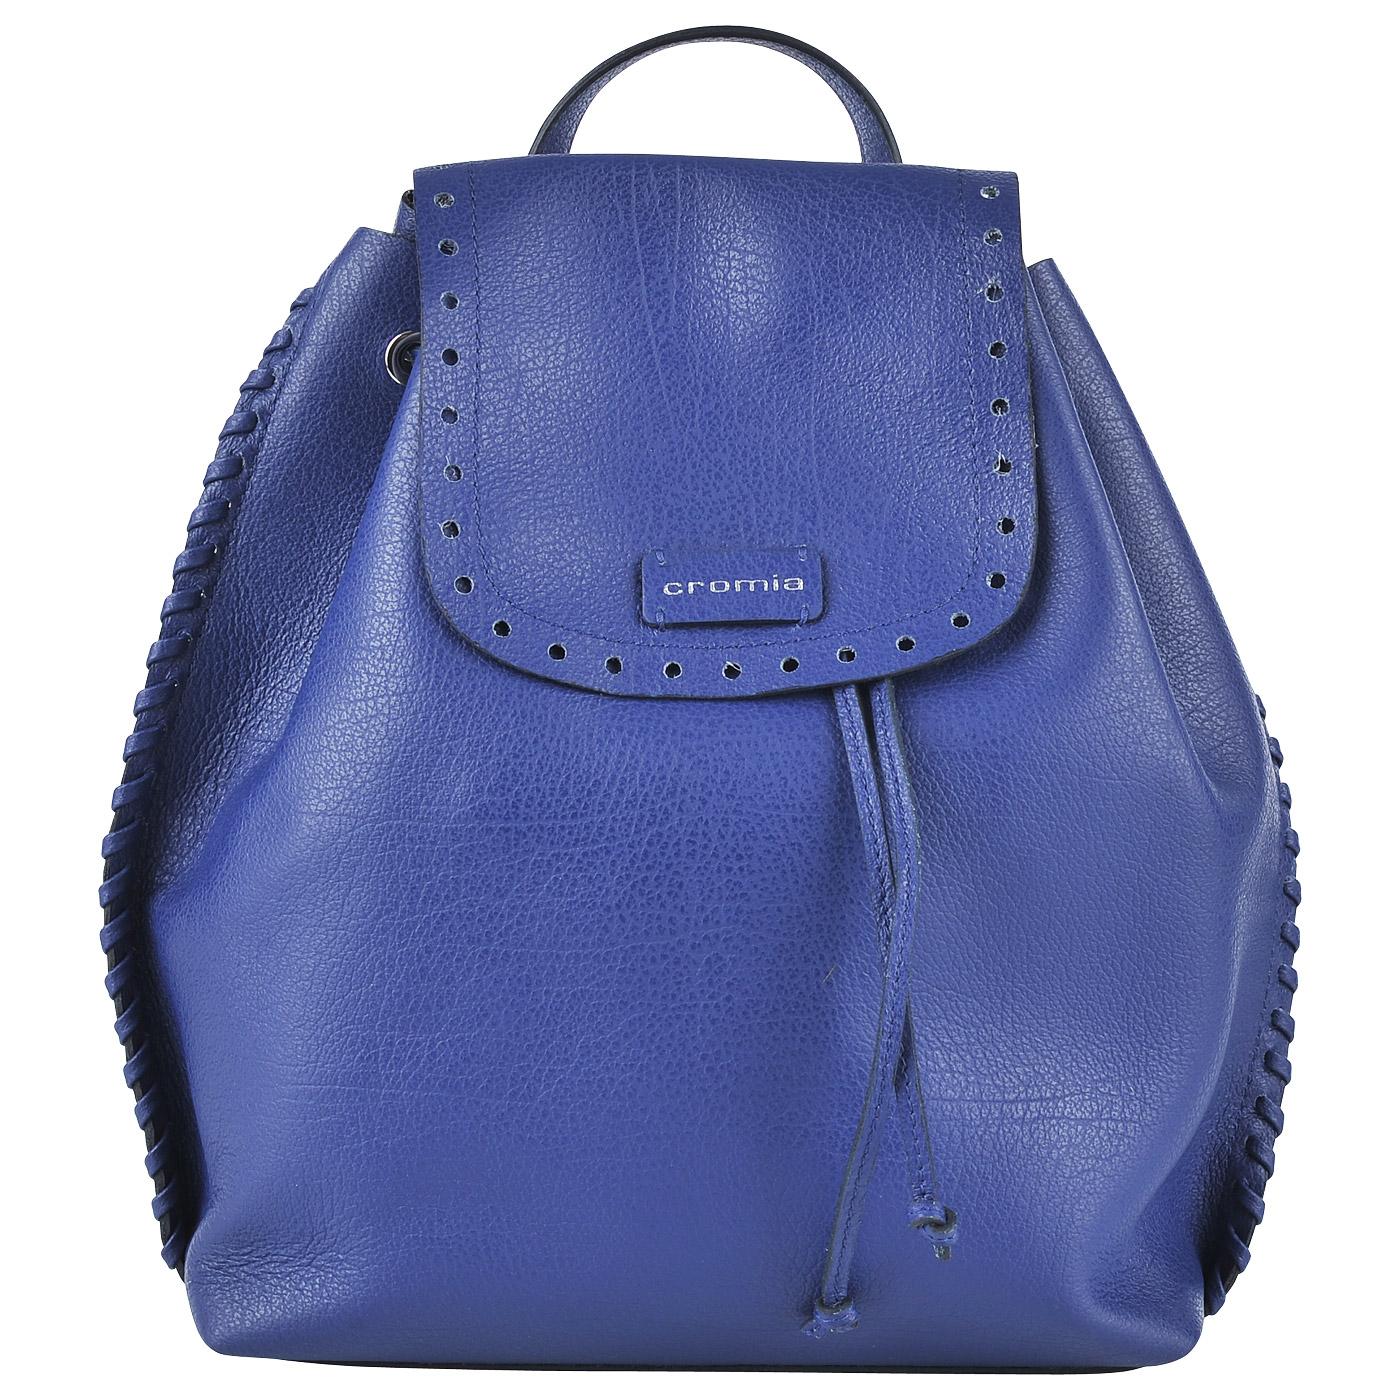 e4d65f98b5ff Женский кожаный рюкзак Cromia Pedra 1403296 jeans - 2000557669864 ...